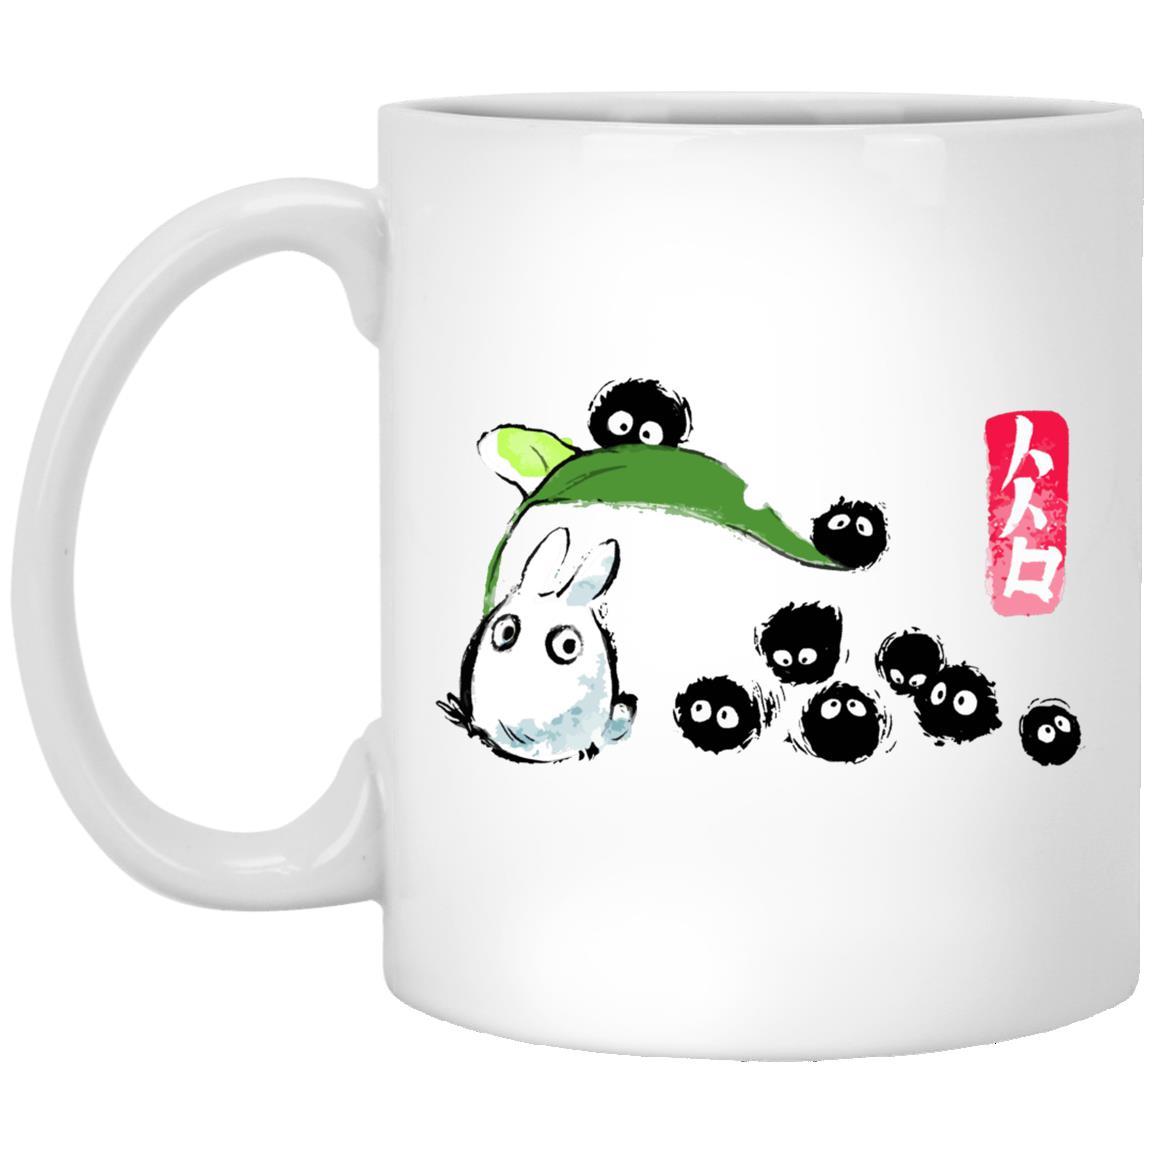 Mini Totoro and the Soot Balls Mug